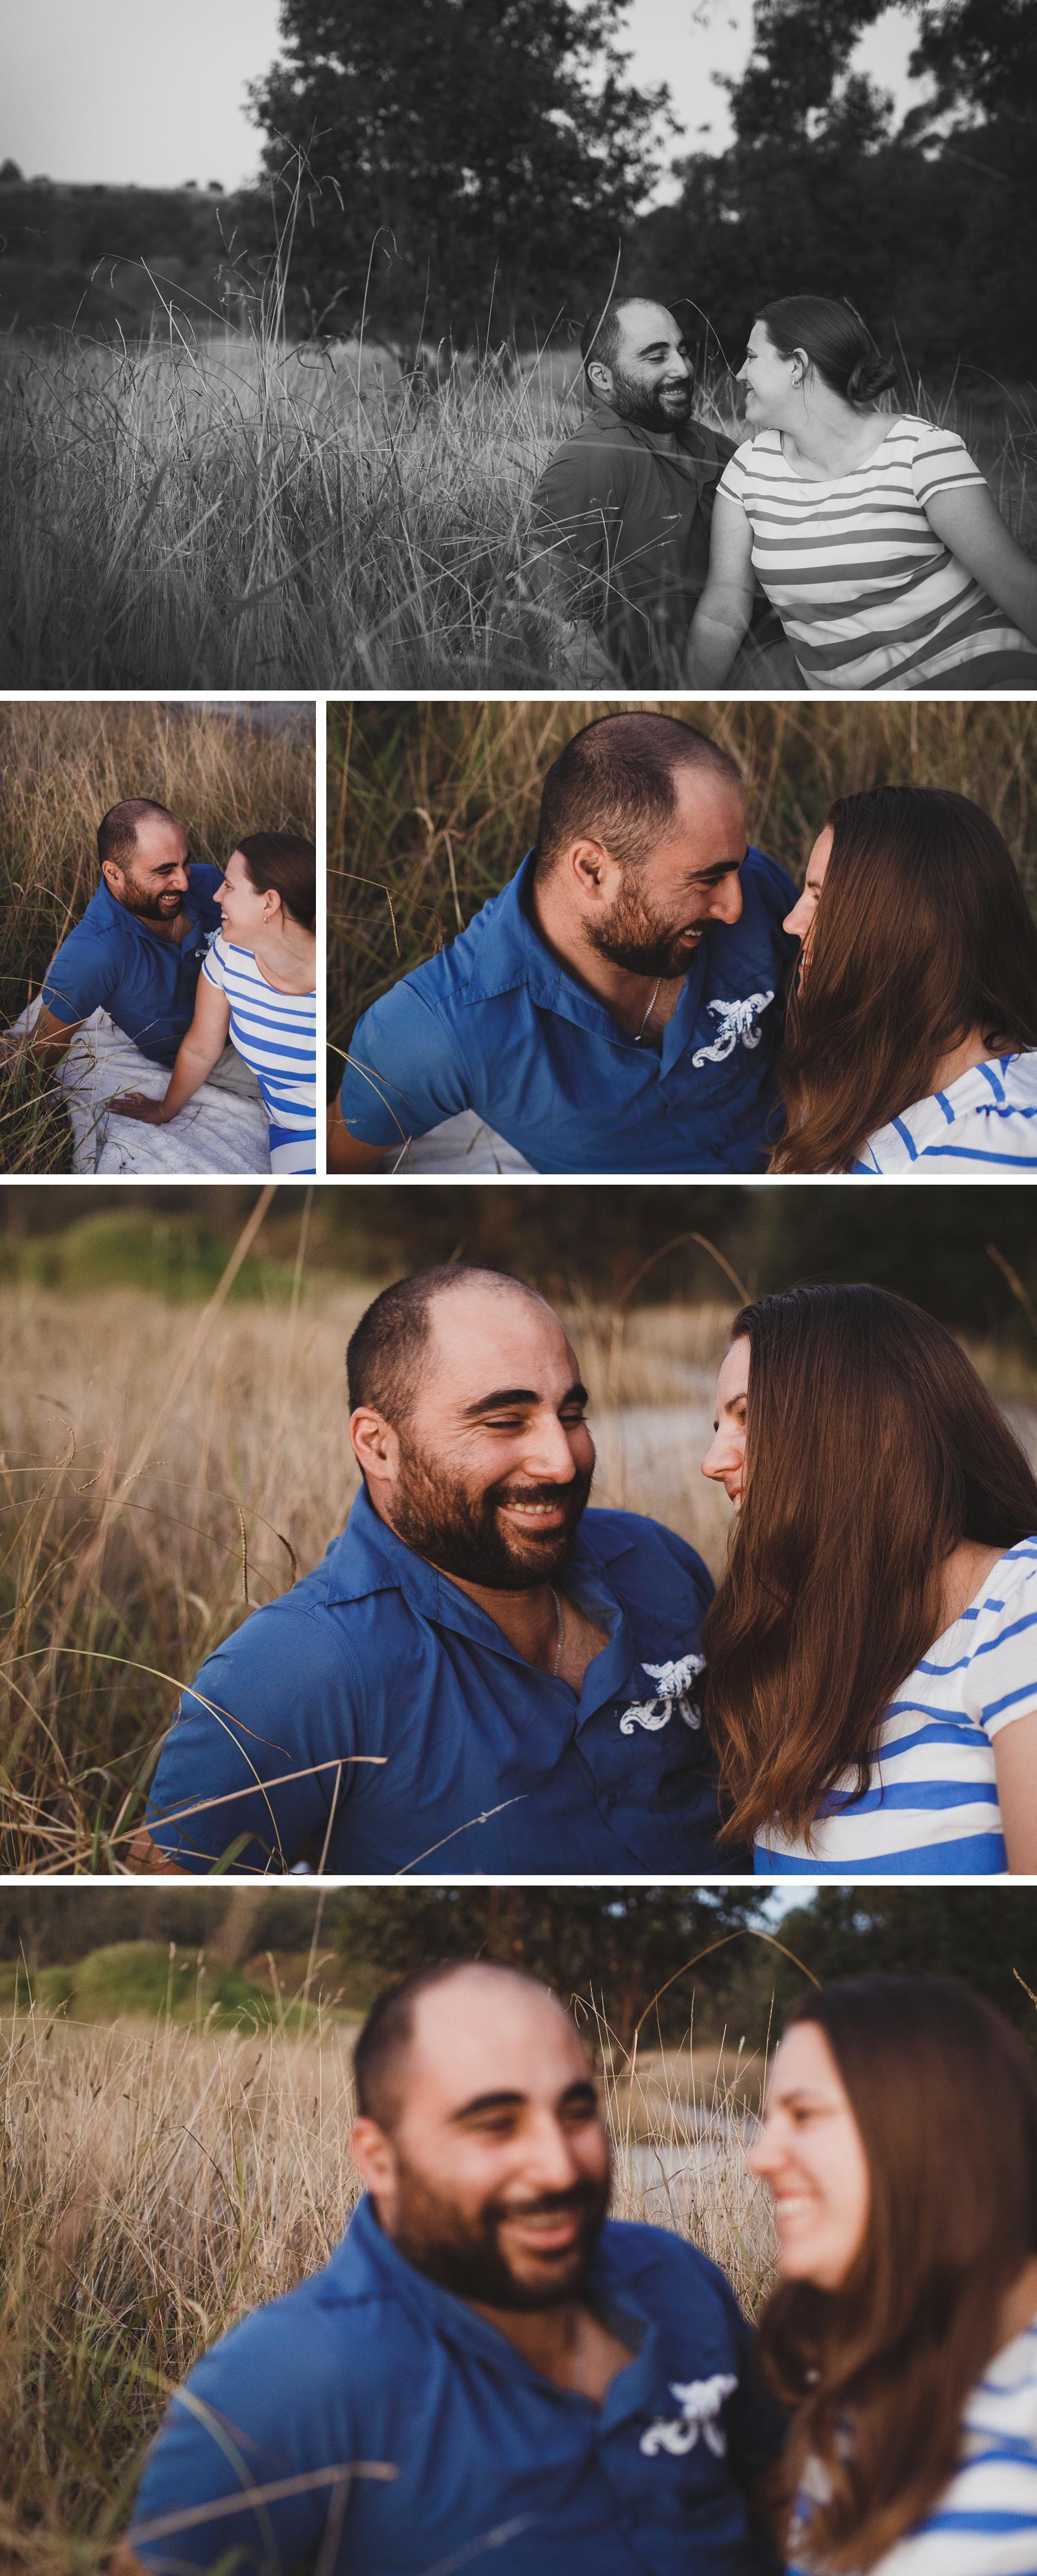 Lake Narracan Gippsland Engagement Shoot, Couple Embracing Engagement Photo by Danae Studios